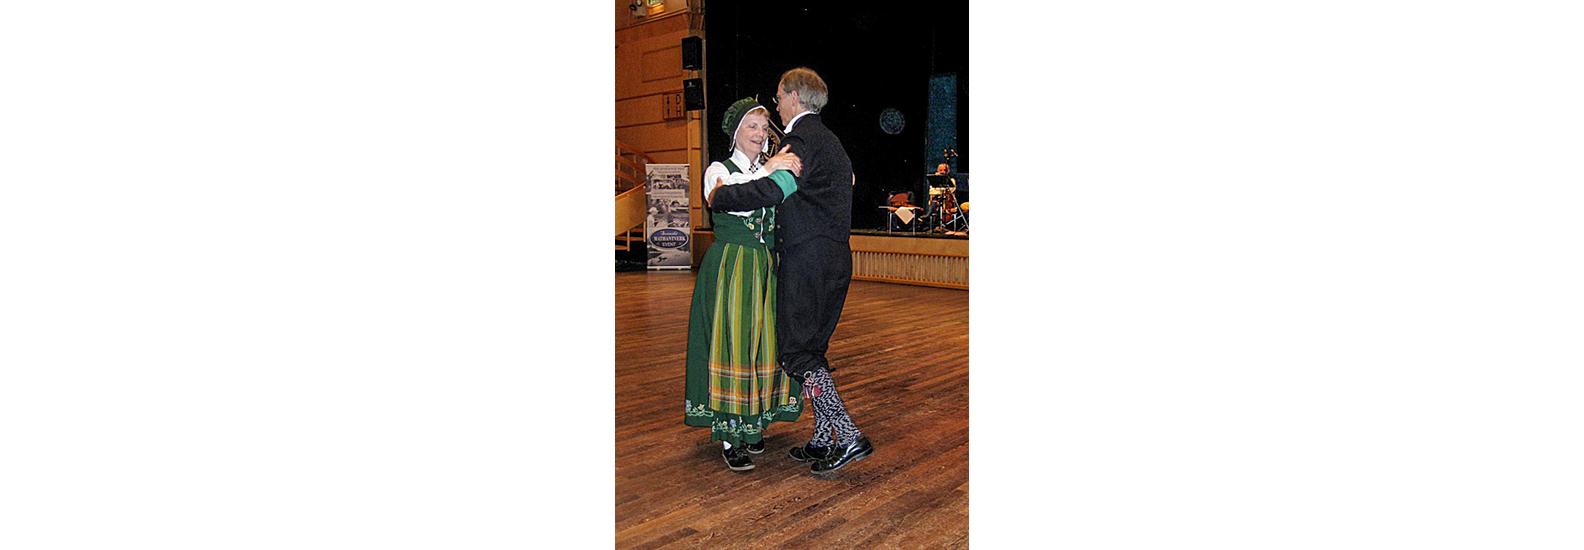 Uppdansning Diplom: Östersund, Sweden - August 2010 - Linda & Ross